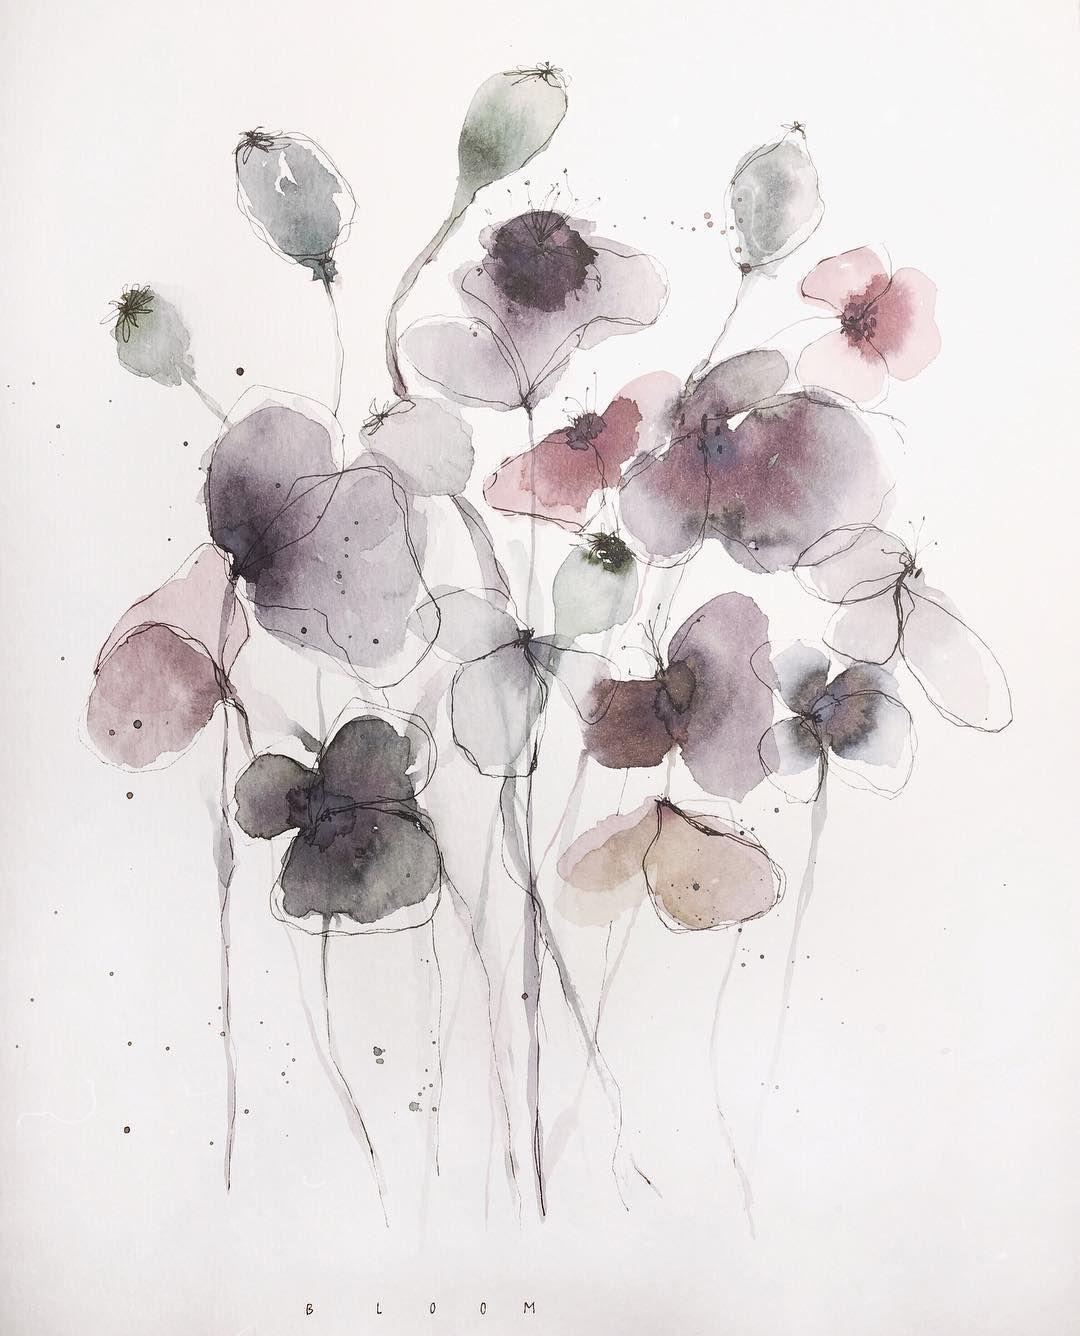 "E l i s a on Instagram: ""Ein bisschen Fast-schon-Frühling. #floral #wildflowers #pastel #botanical #watercolor #illustration #bloom #nature #aquarelle…"""